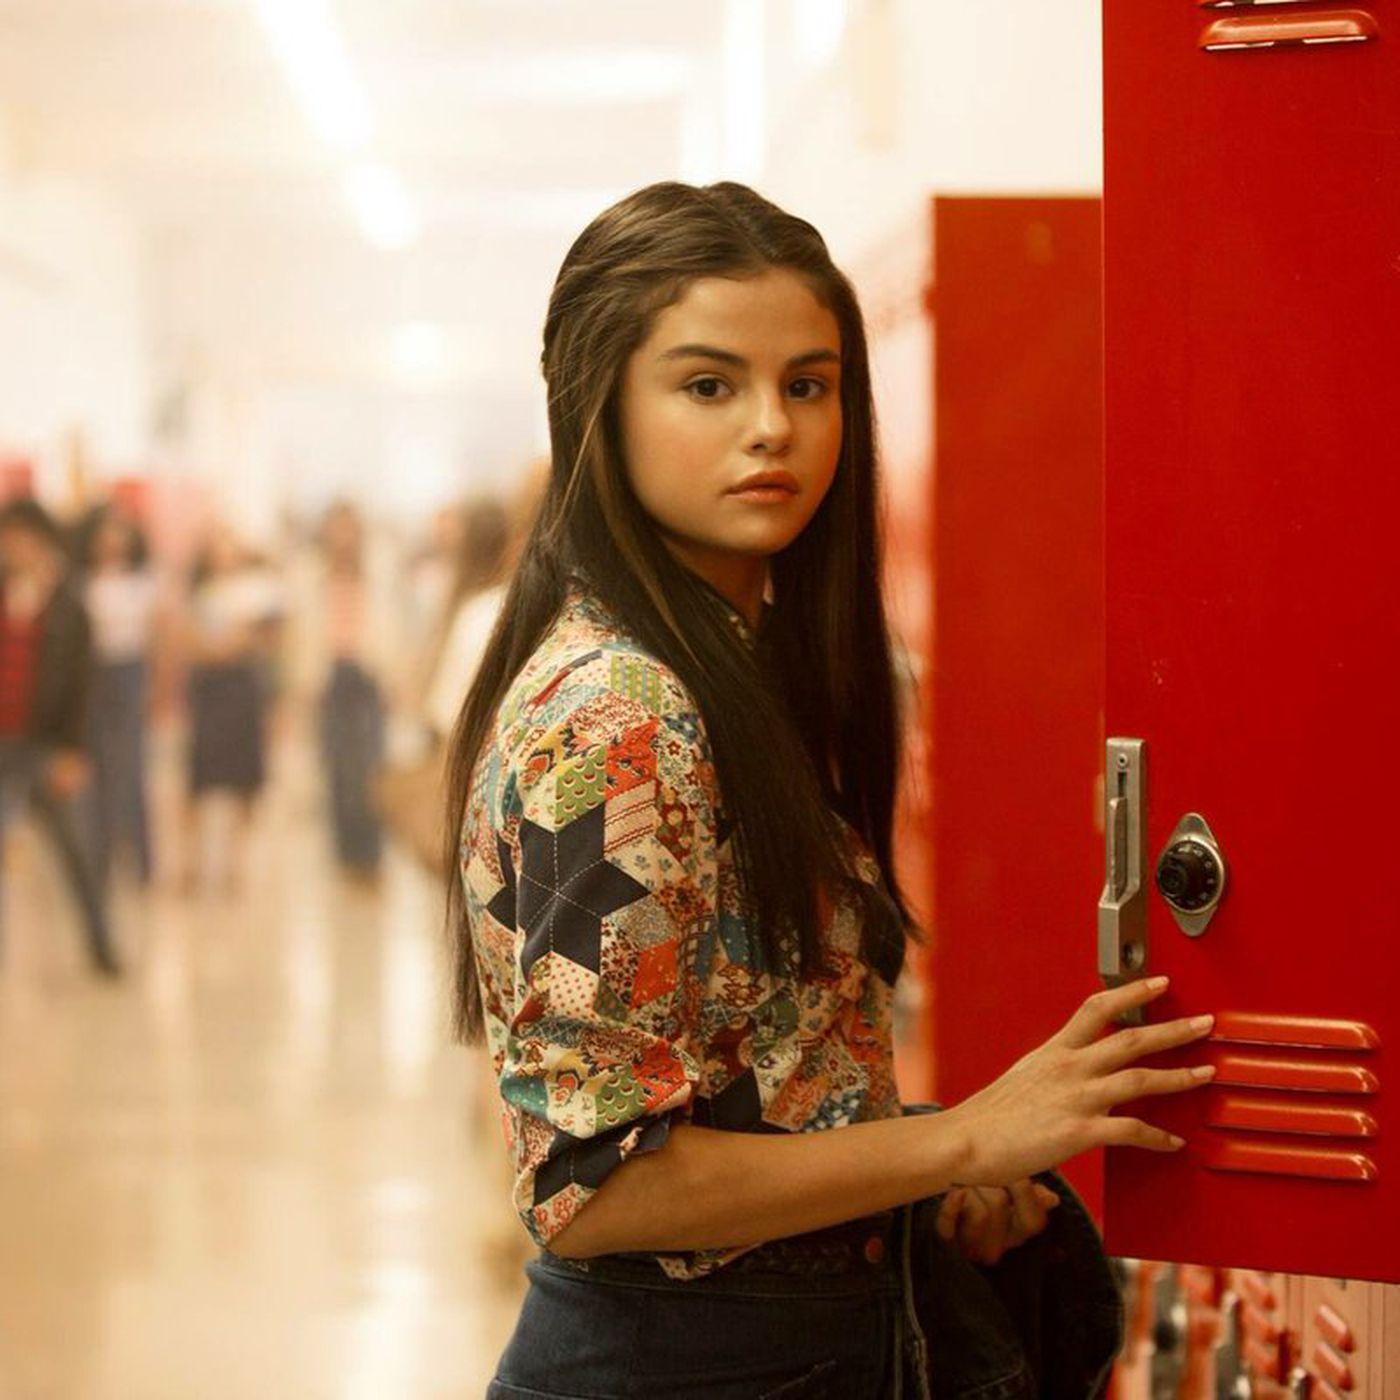 Bad Liars Costume Designer On Dressing Selena Gomez In 70s Vintage